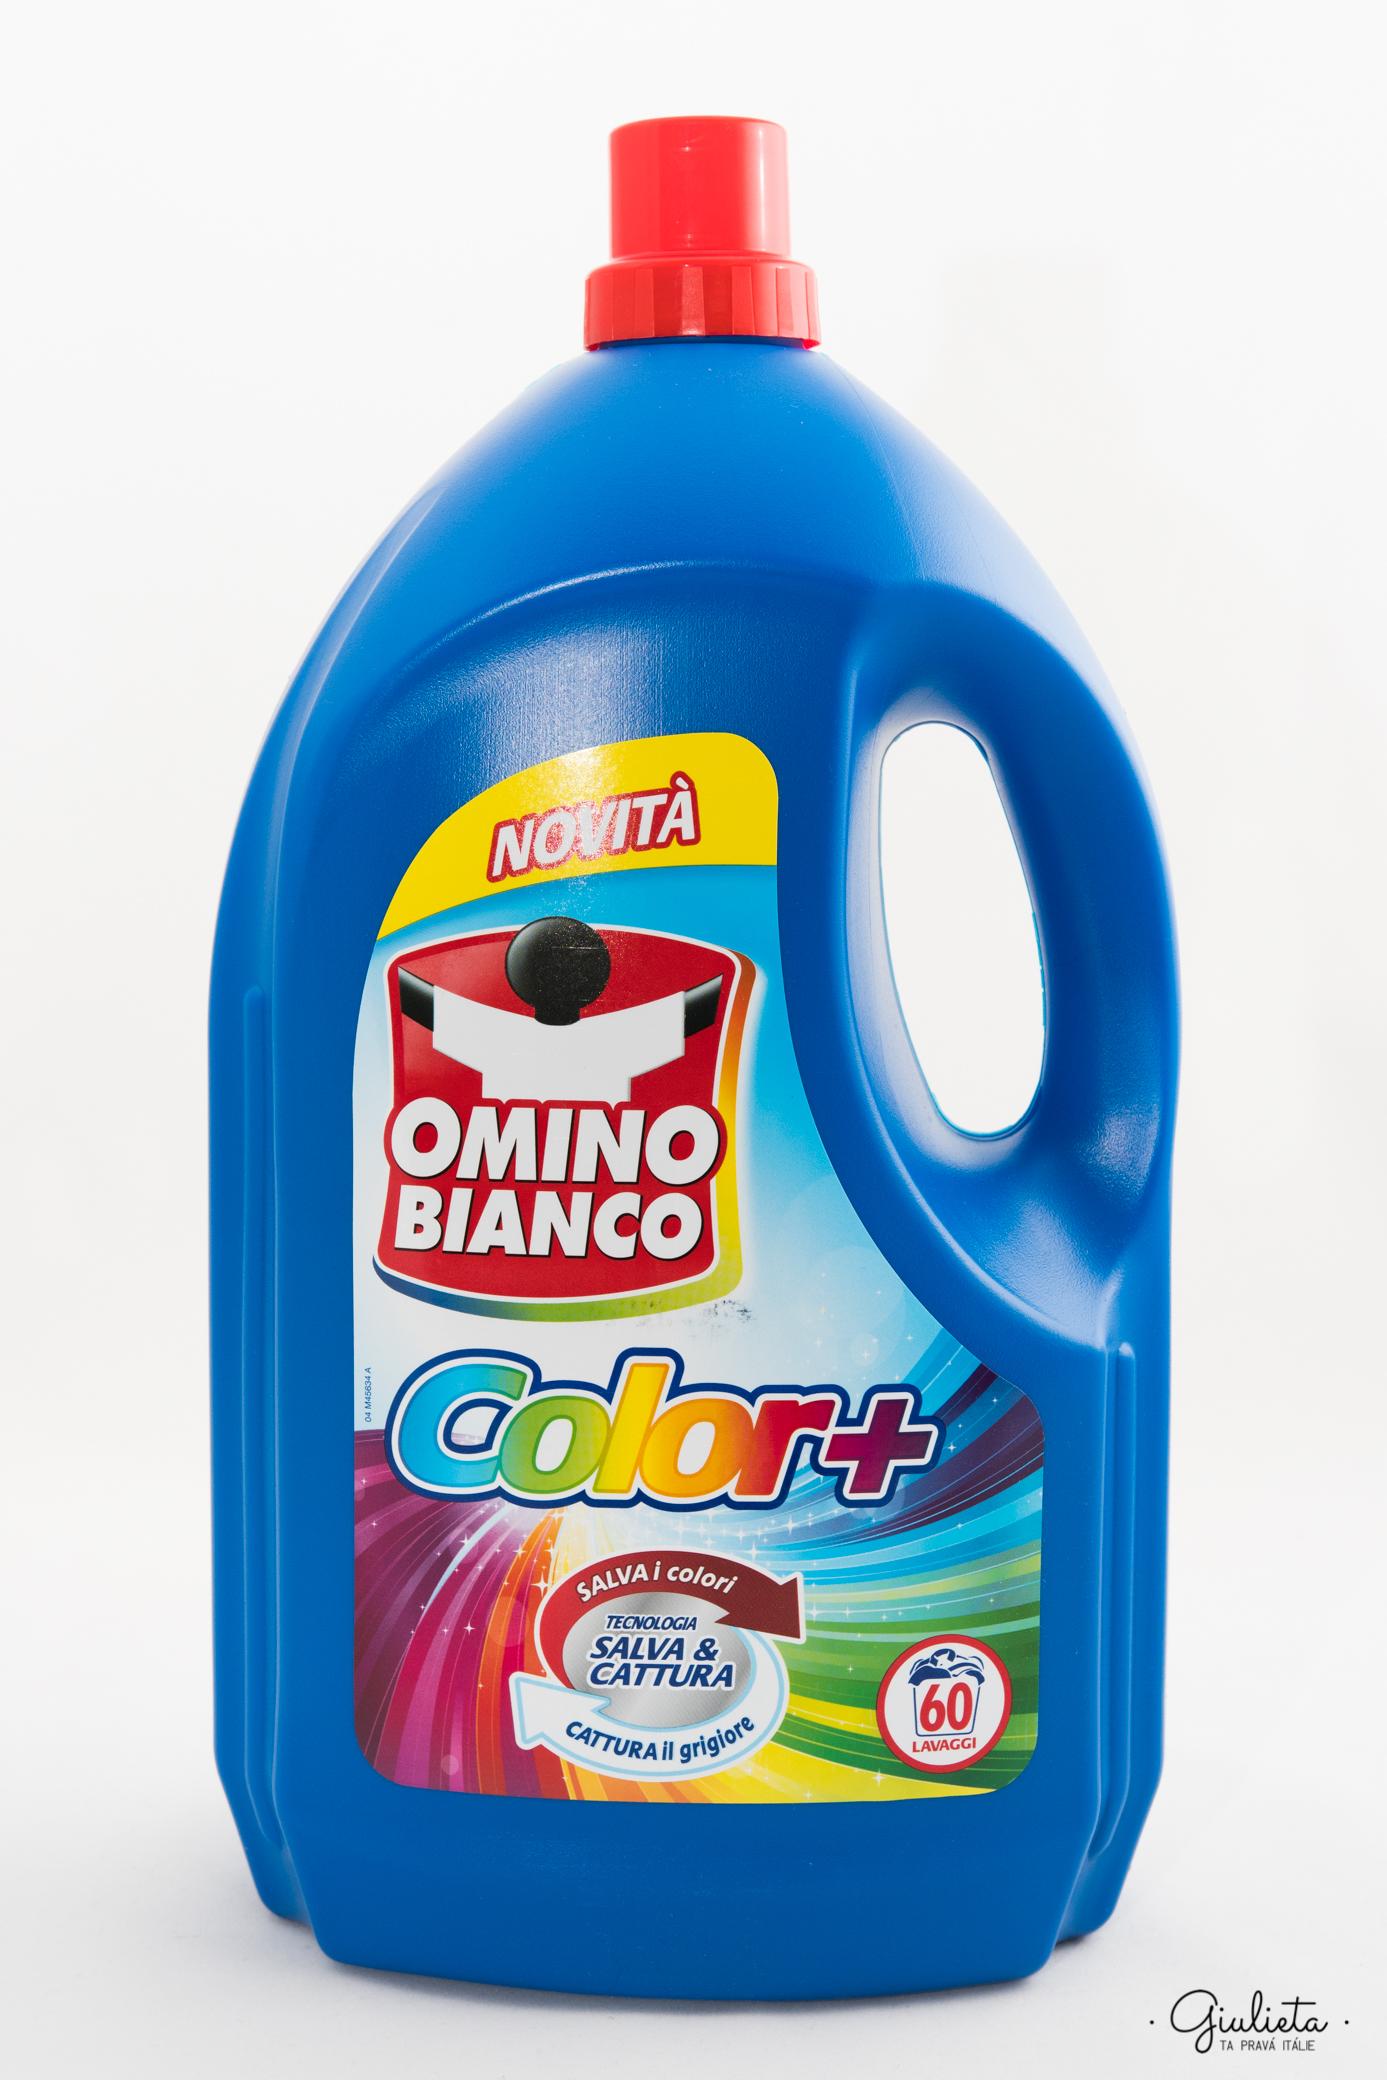 OMINO BIANCO PRACÍ GEL, 60 MIS. COLOR+ 3,9 L